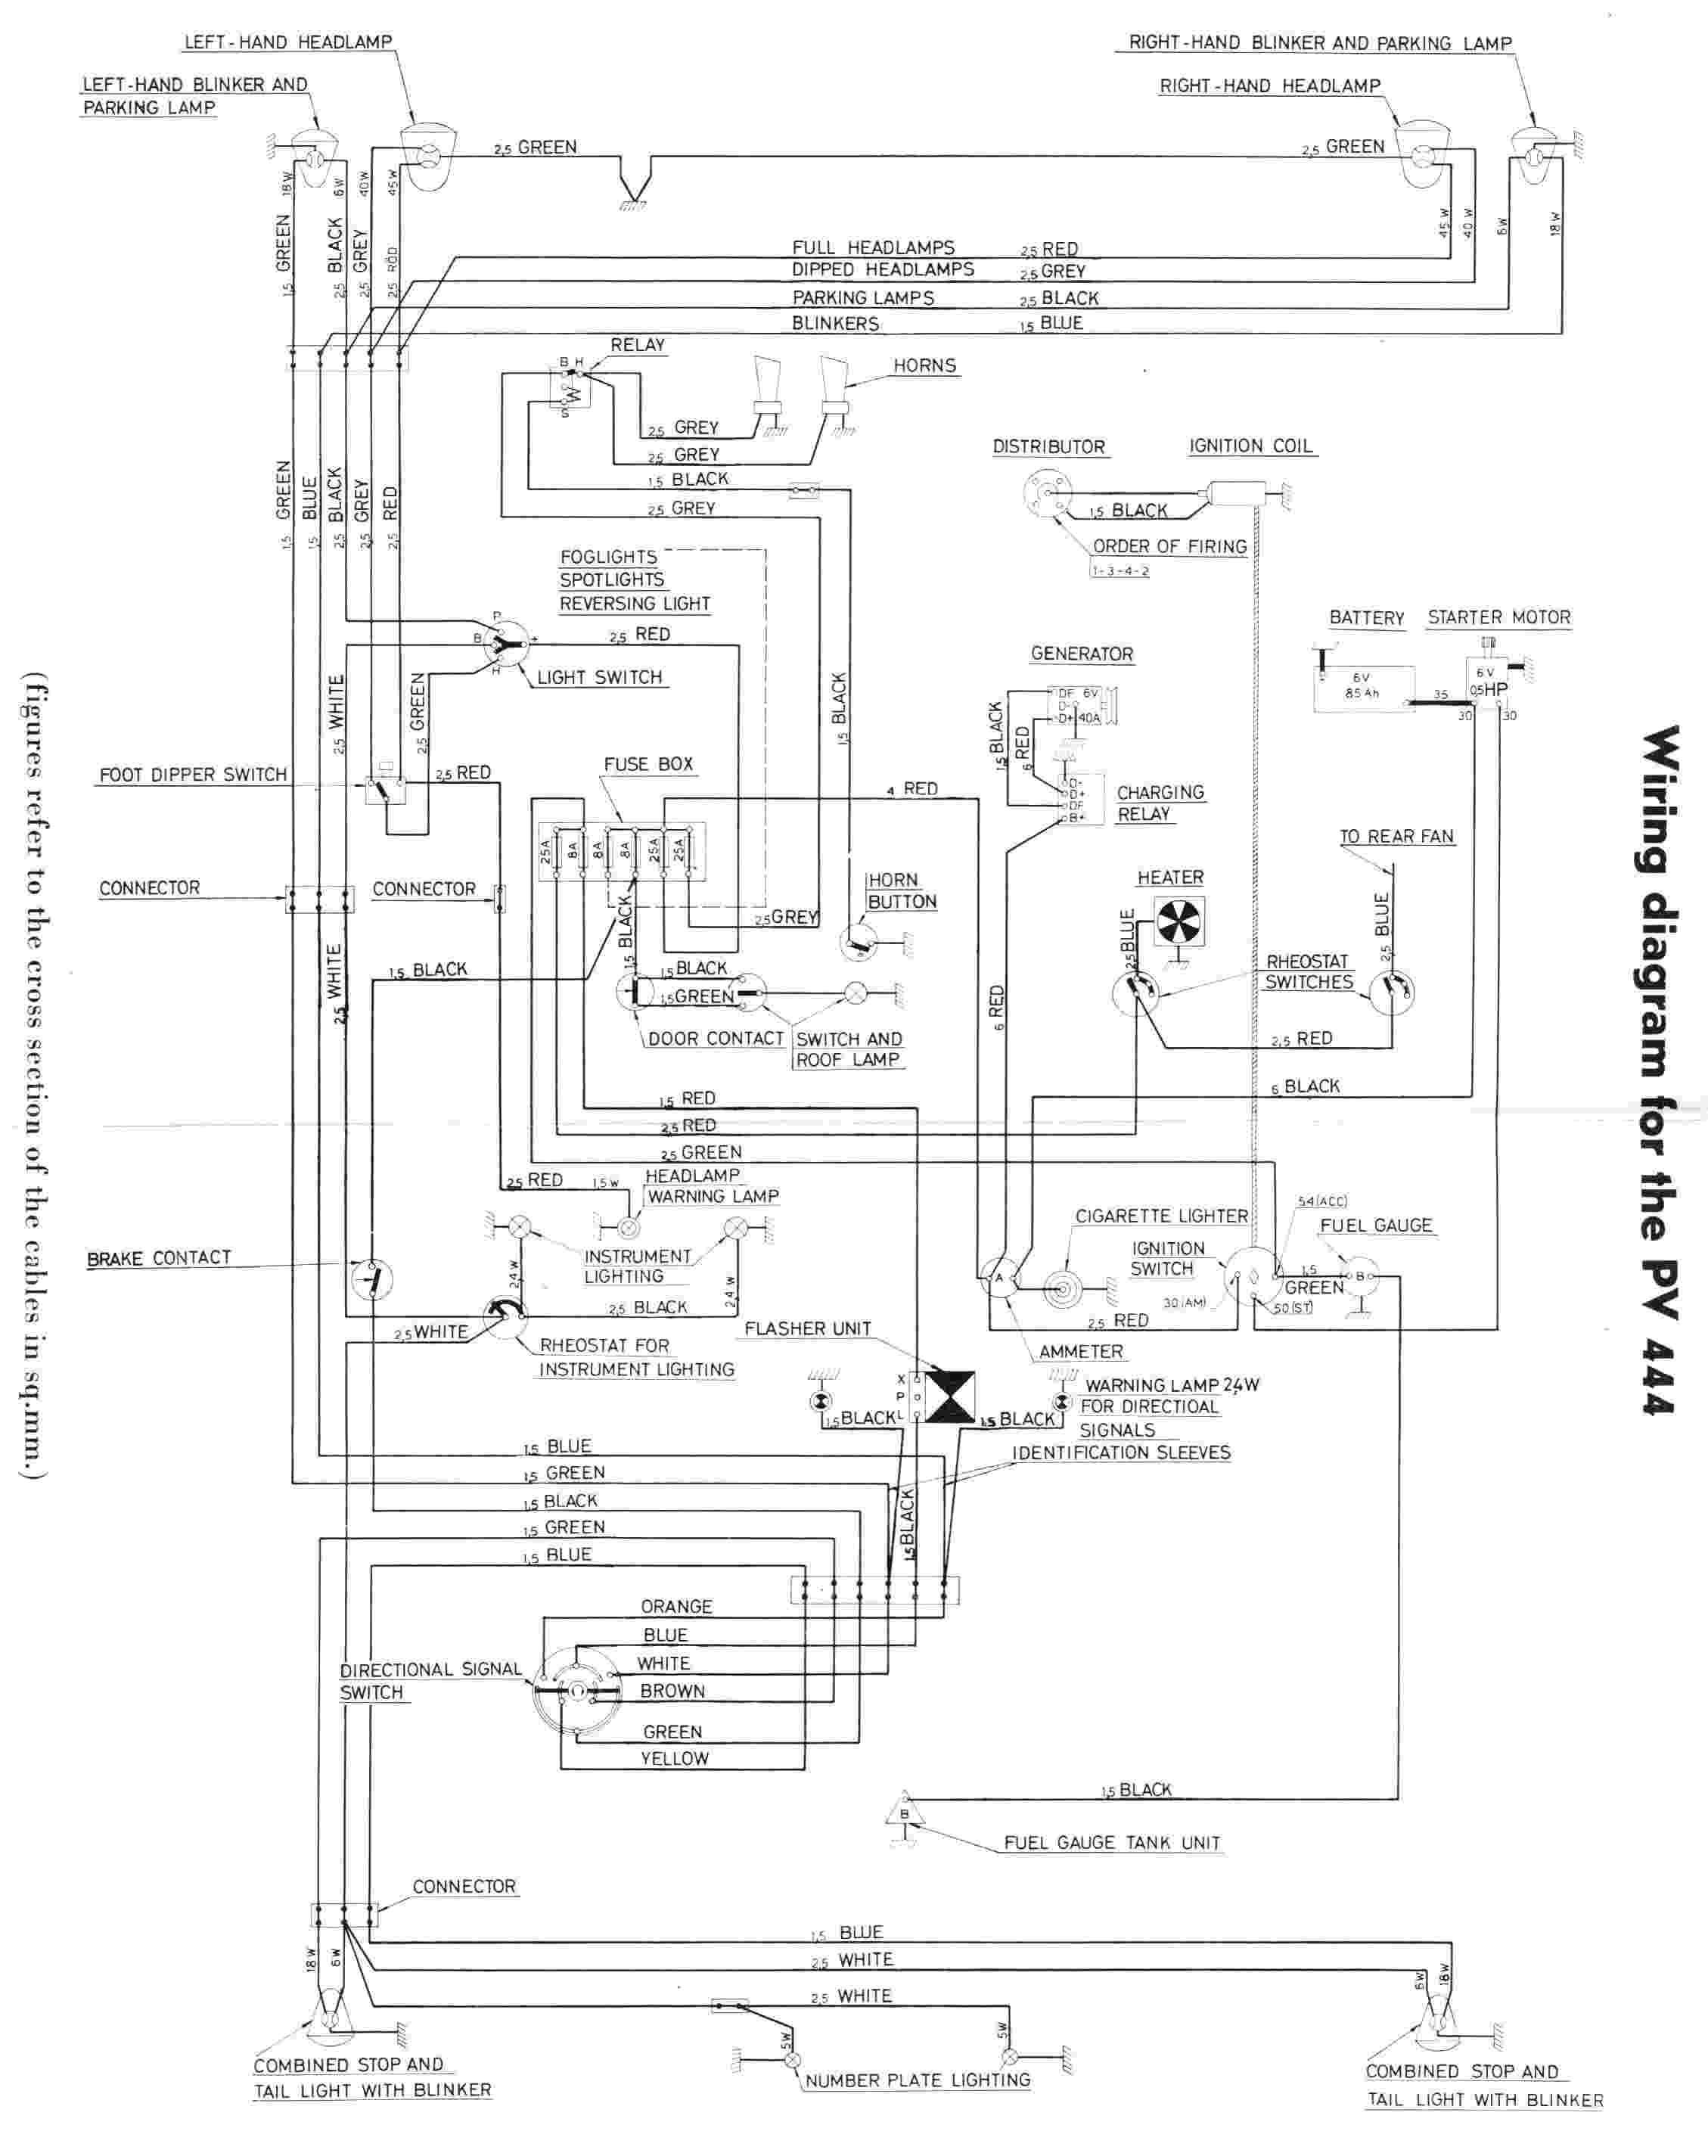 volvo wiring diagrams 850 clipsal rj45 wall plate diagram somurich